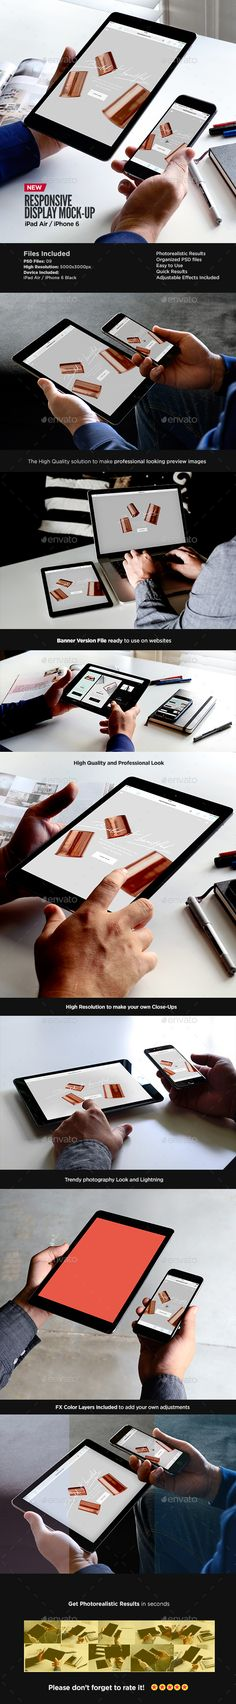 iPad Air iPhone Responsive Display Web App Mock-Up #design Download: http://graphicriver.net/item/ipad-air-iphone-responsive-display-web-app-mockup/13711991?ref=ksioks